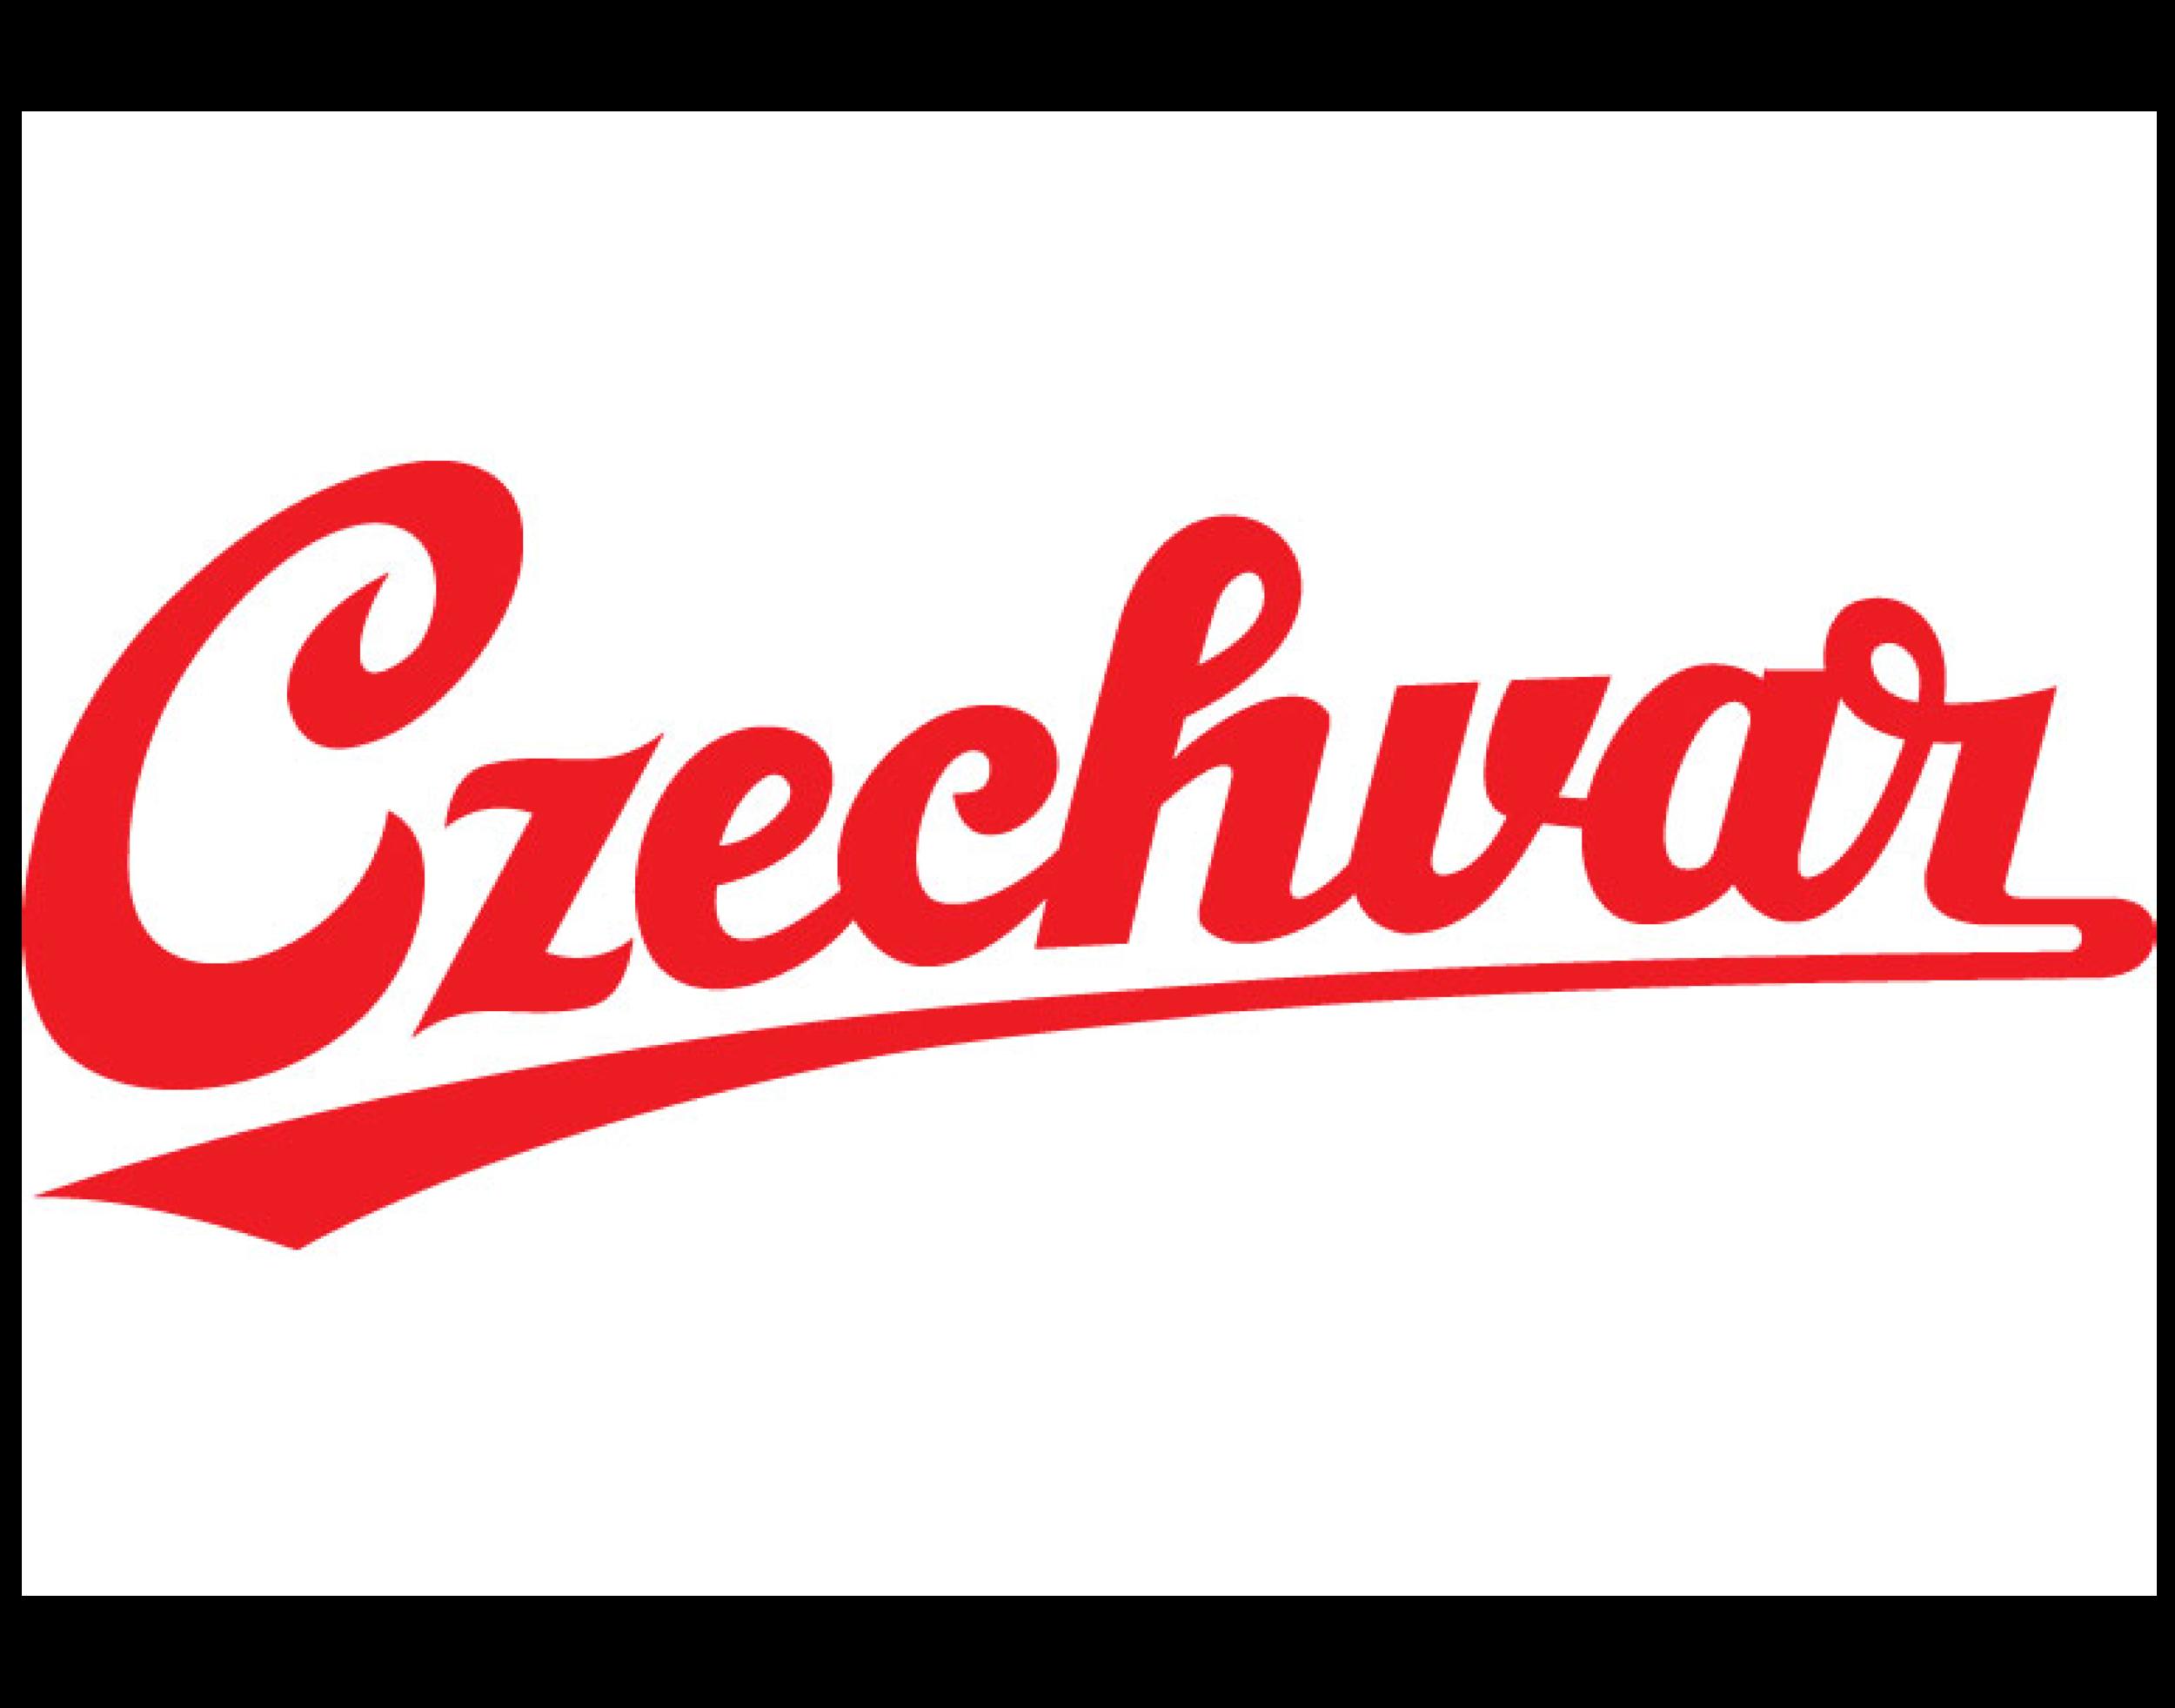 Czechvar logo. Links to Czechvar logo.